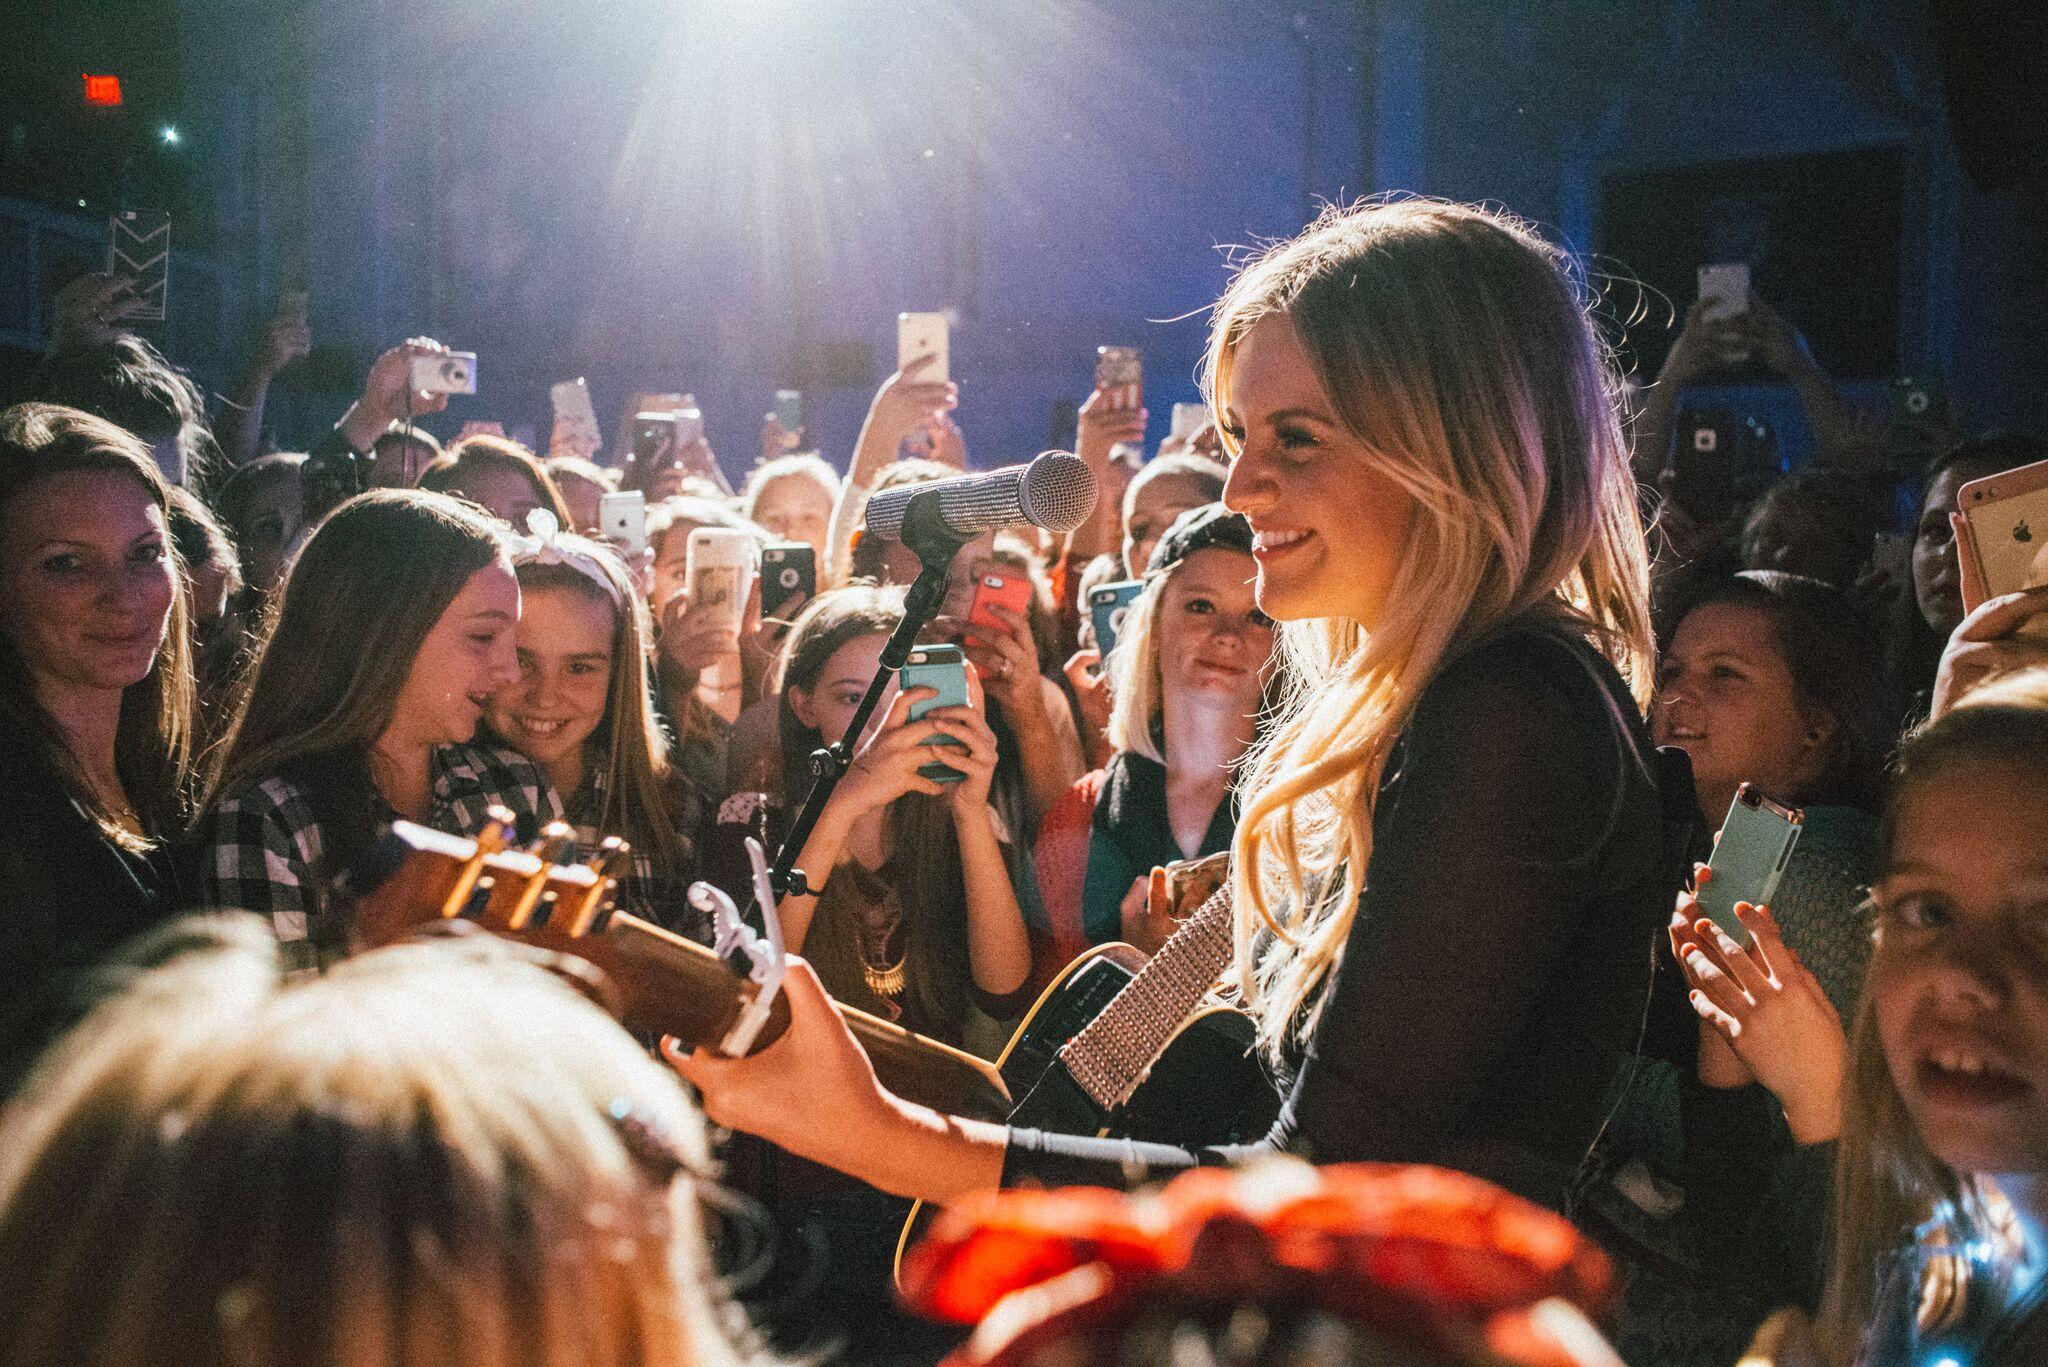 Kelsea Ballerini Sparkles on Headlining Tour Debut